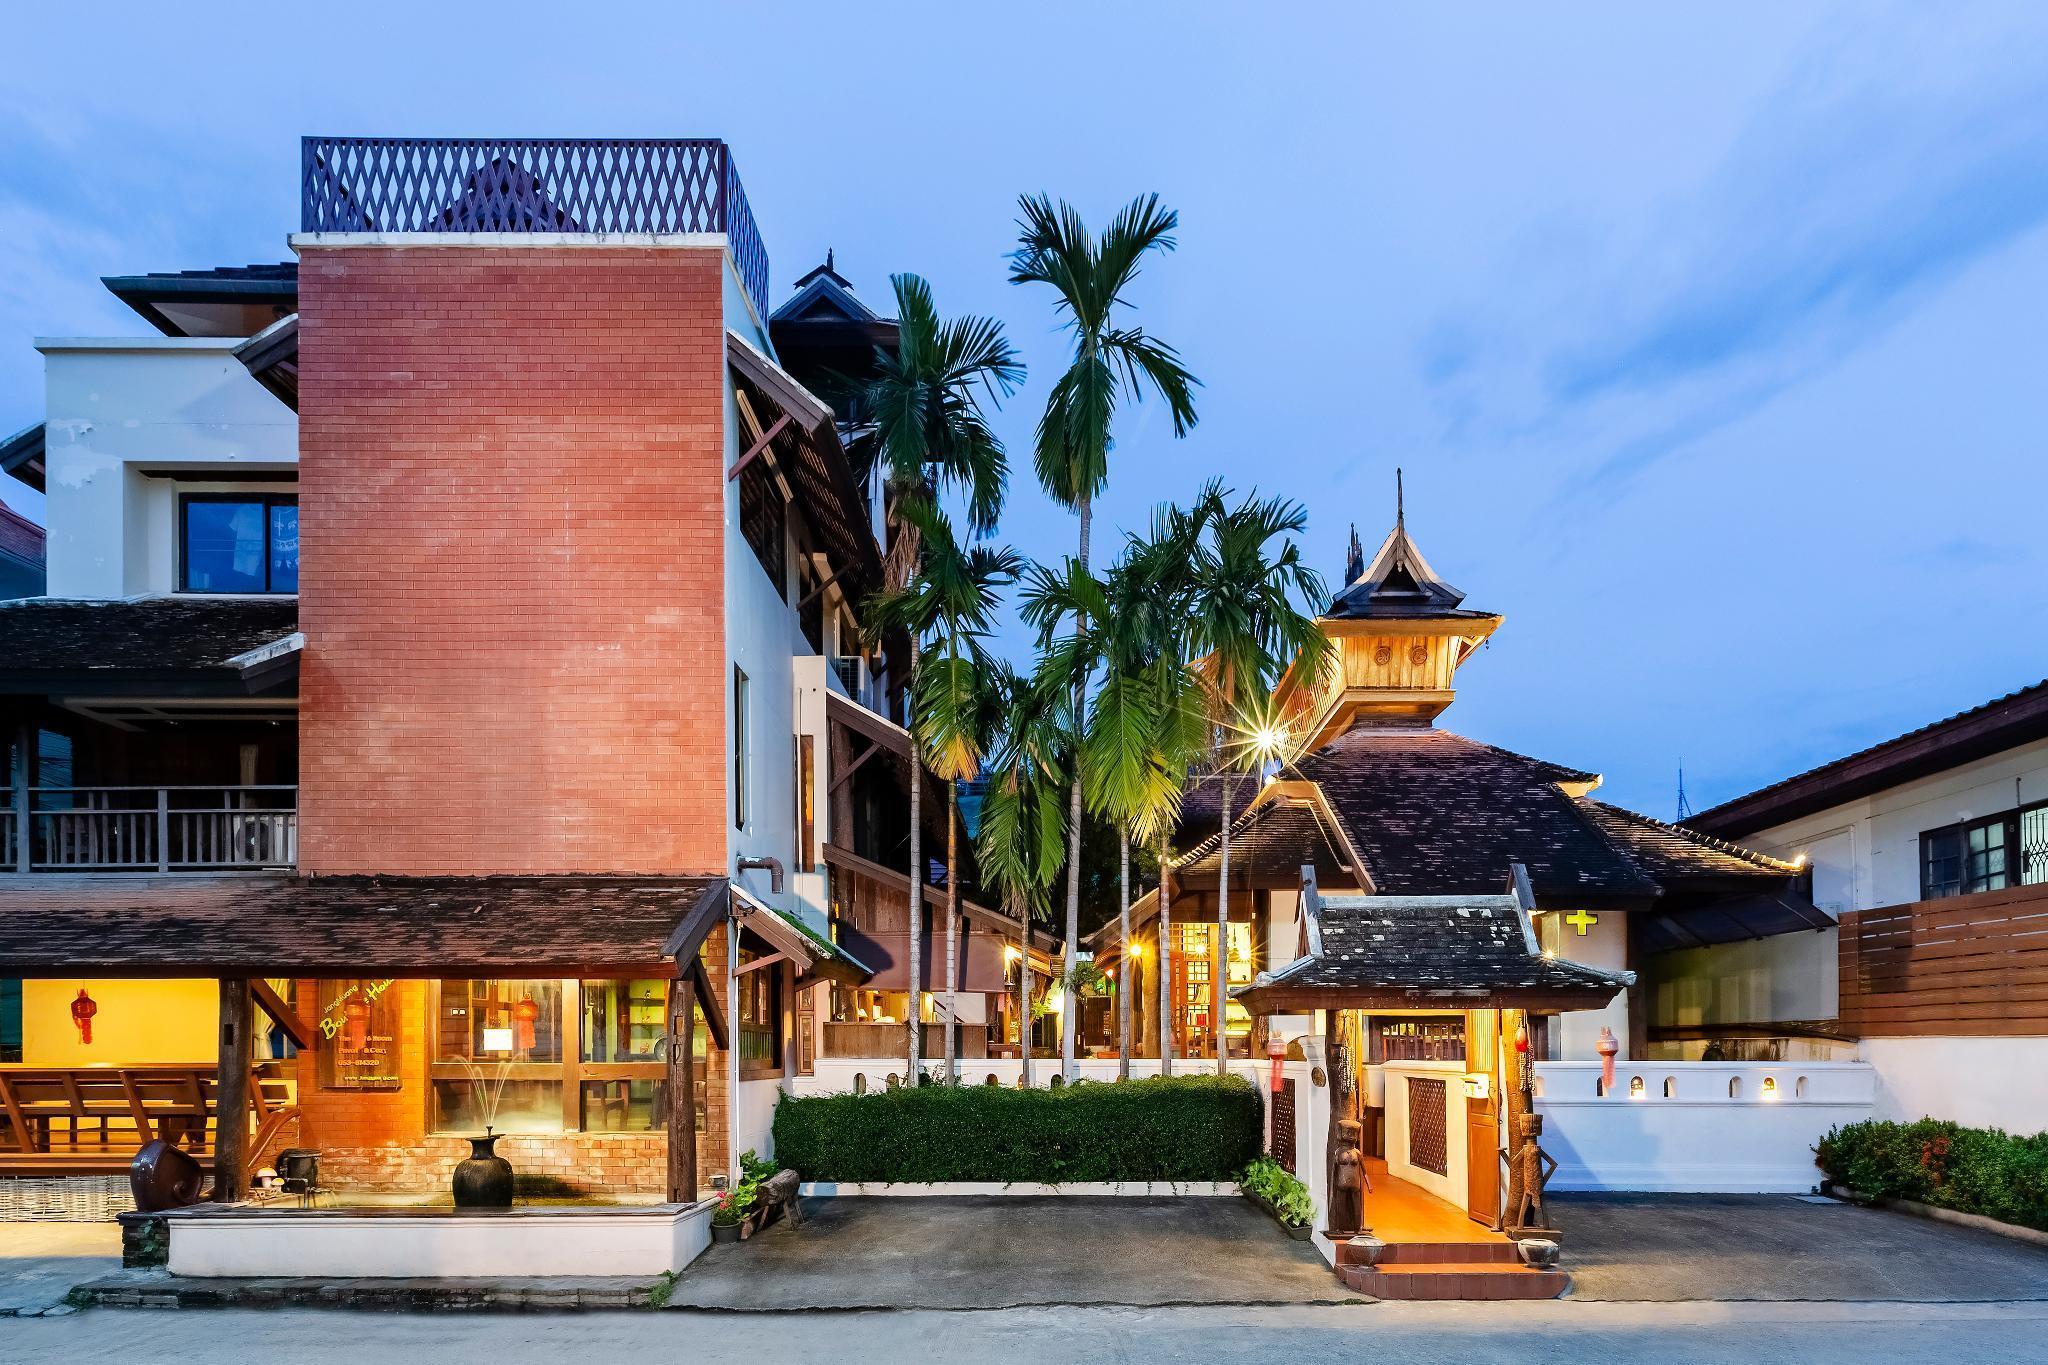 Amata Lanna Jangmuang(Old Name:Jangmuang Boutique House อมตะล้านนาแจ่งเมือง (ชื่อเดิมแจ่งเมืองบูทิกเฮาส์)